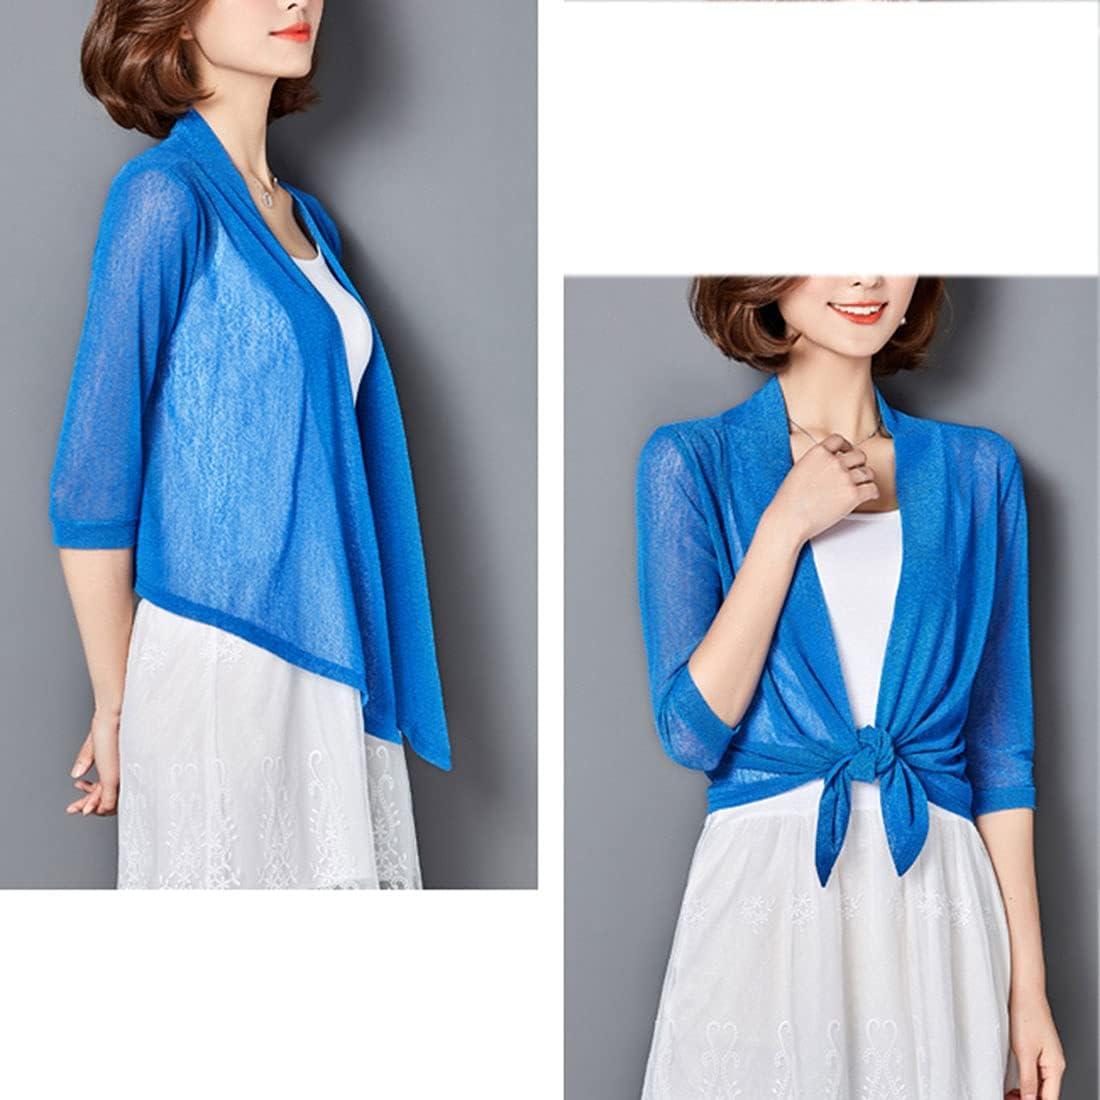 FindThy Women's 1/2 Sleeve Lightweight Tiefront Cardigan Sheer Dots Bolero Shrug Knitwear